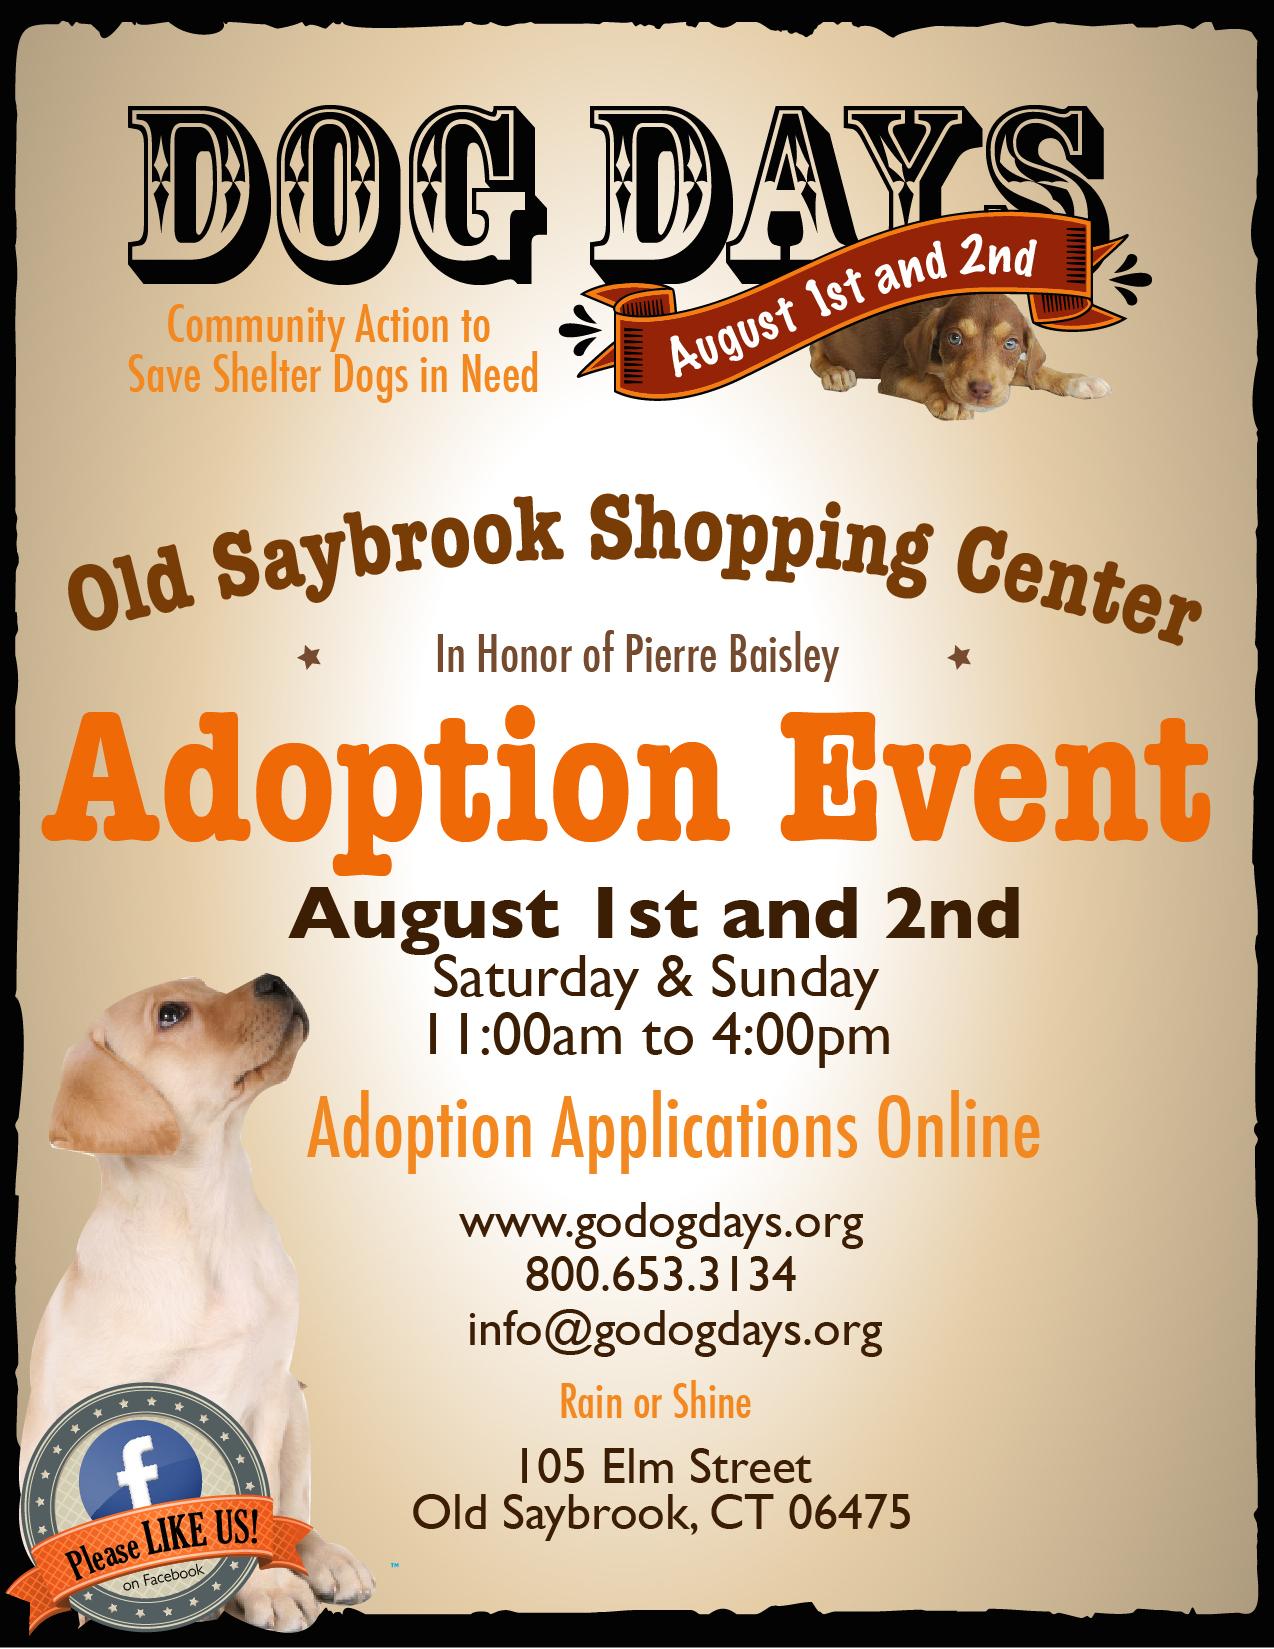 DOG DAYS ADOPTION EVENT – OLD SAYBROOK